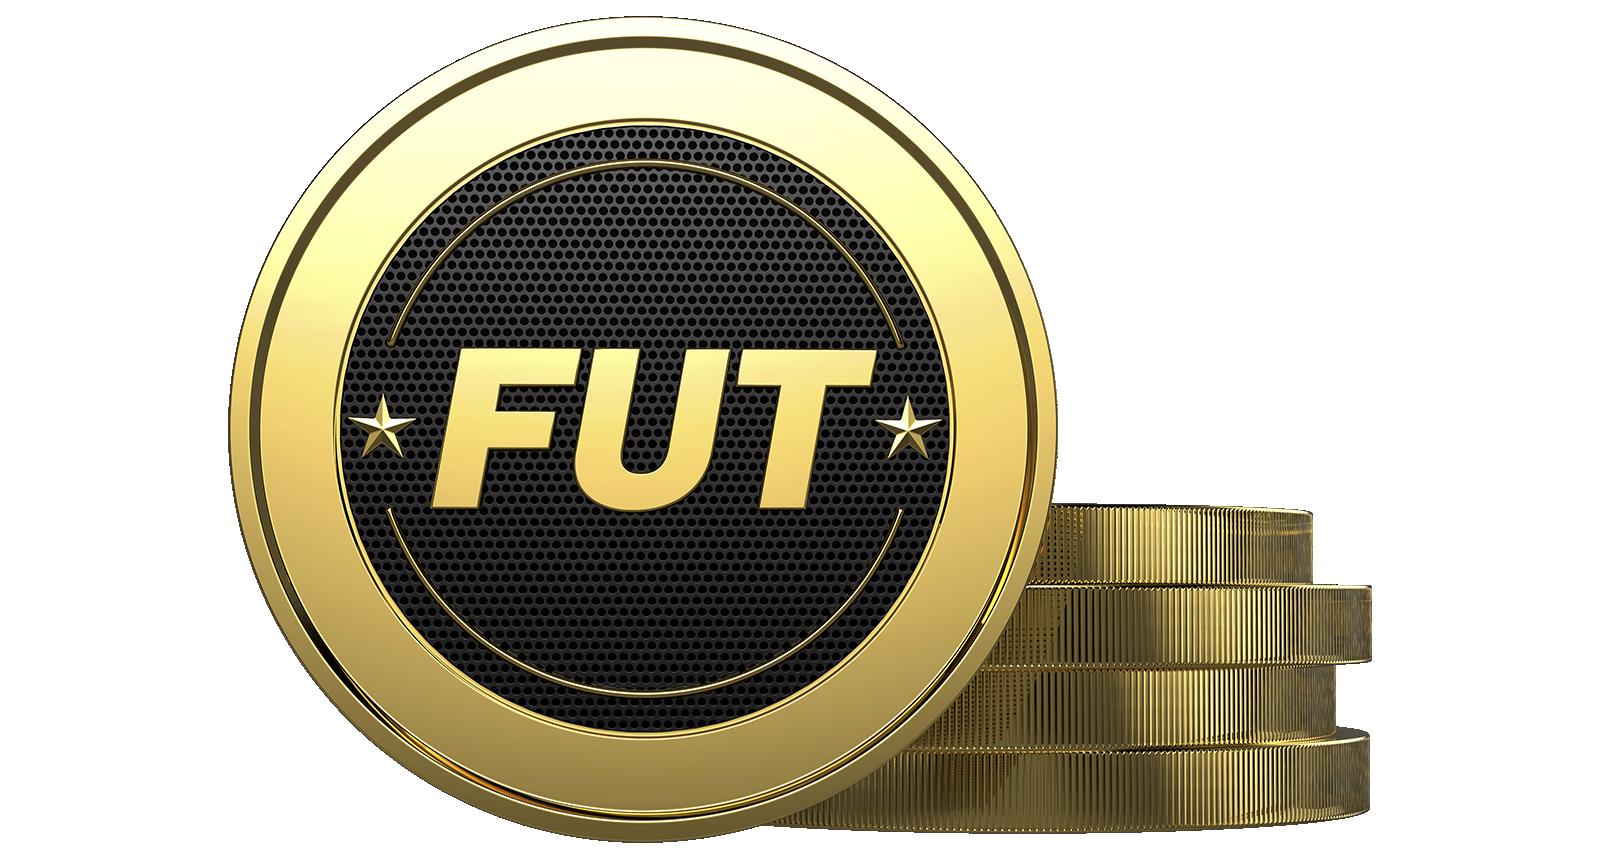 FIFA Ultimate Team - fifa coins art